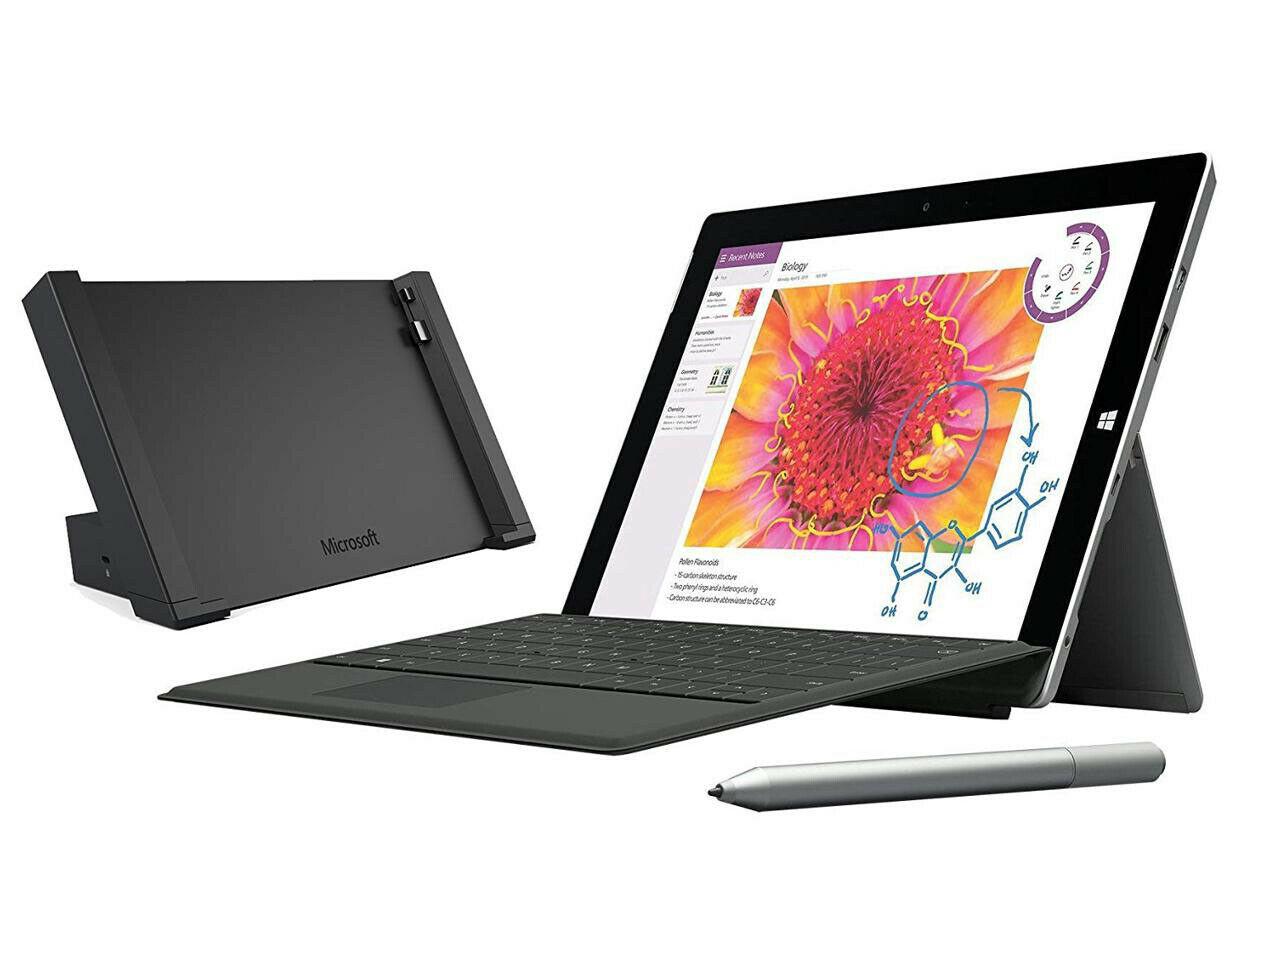 Microsoft Surface 3 10.8 128GB 4G QWERTY (refurbished)  inkl. Docking Station, Tastatur und Stift